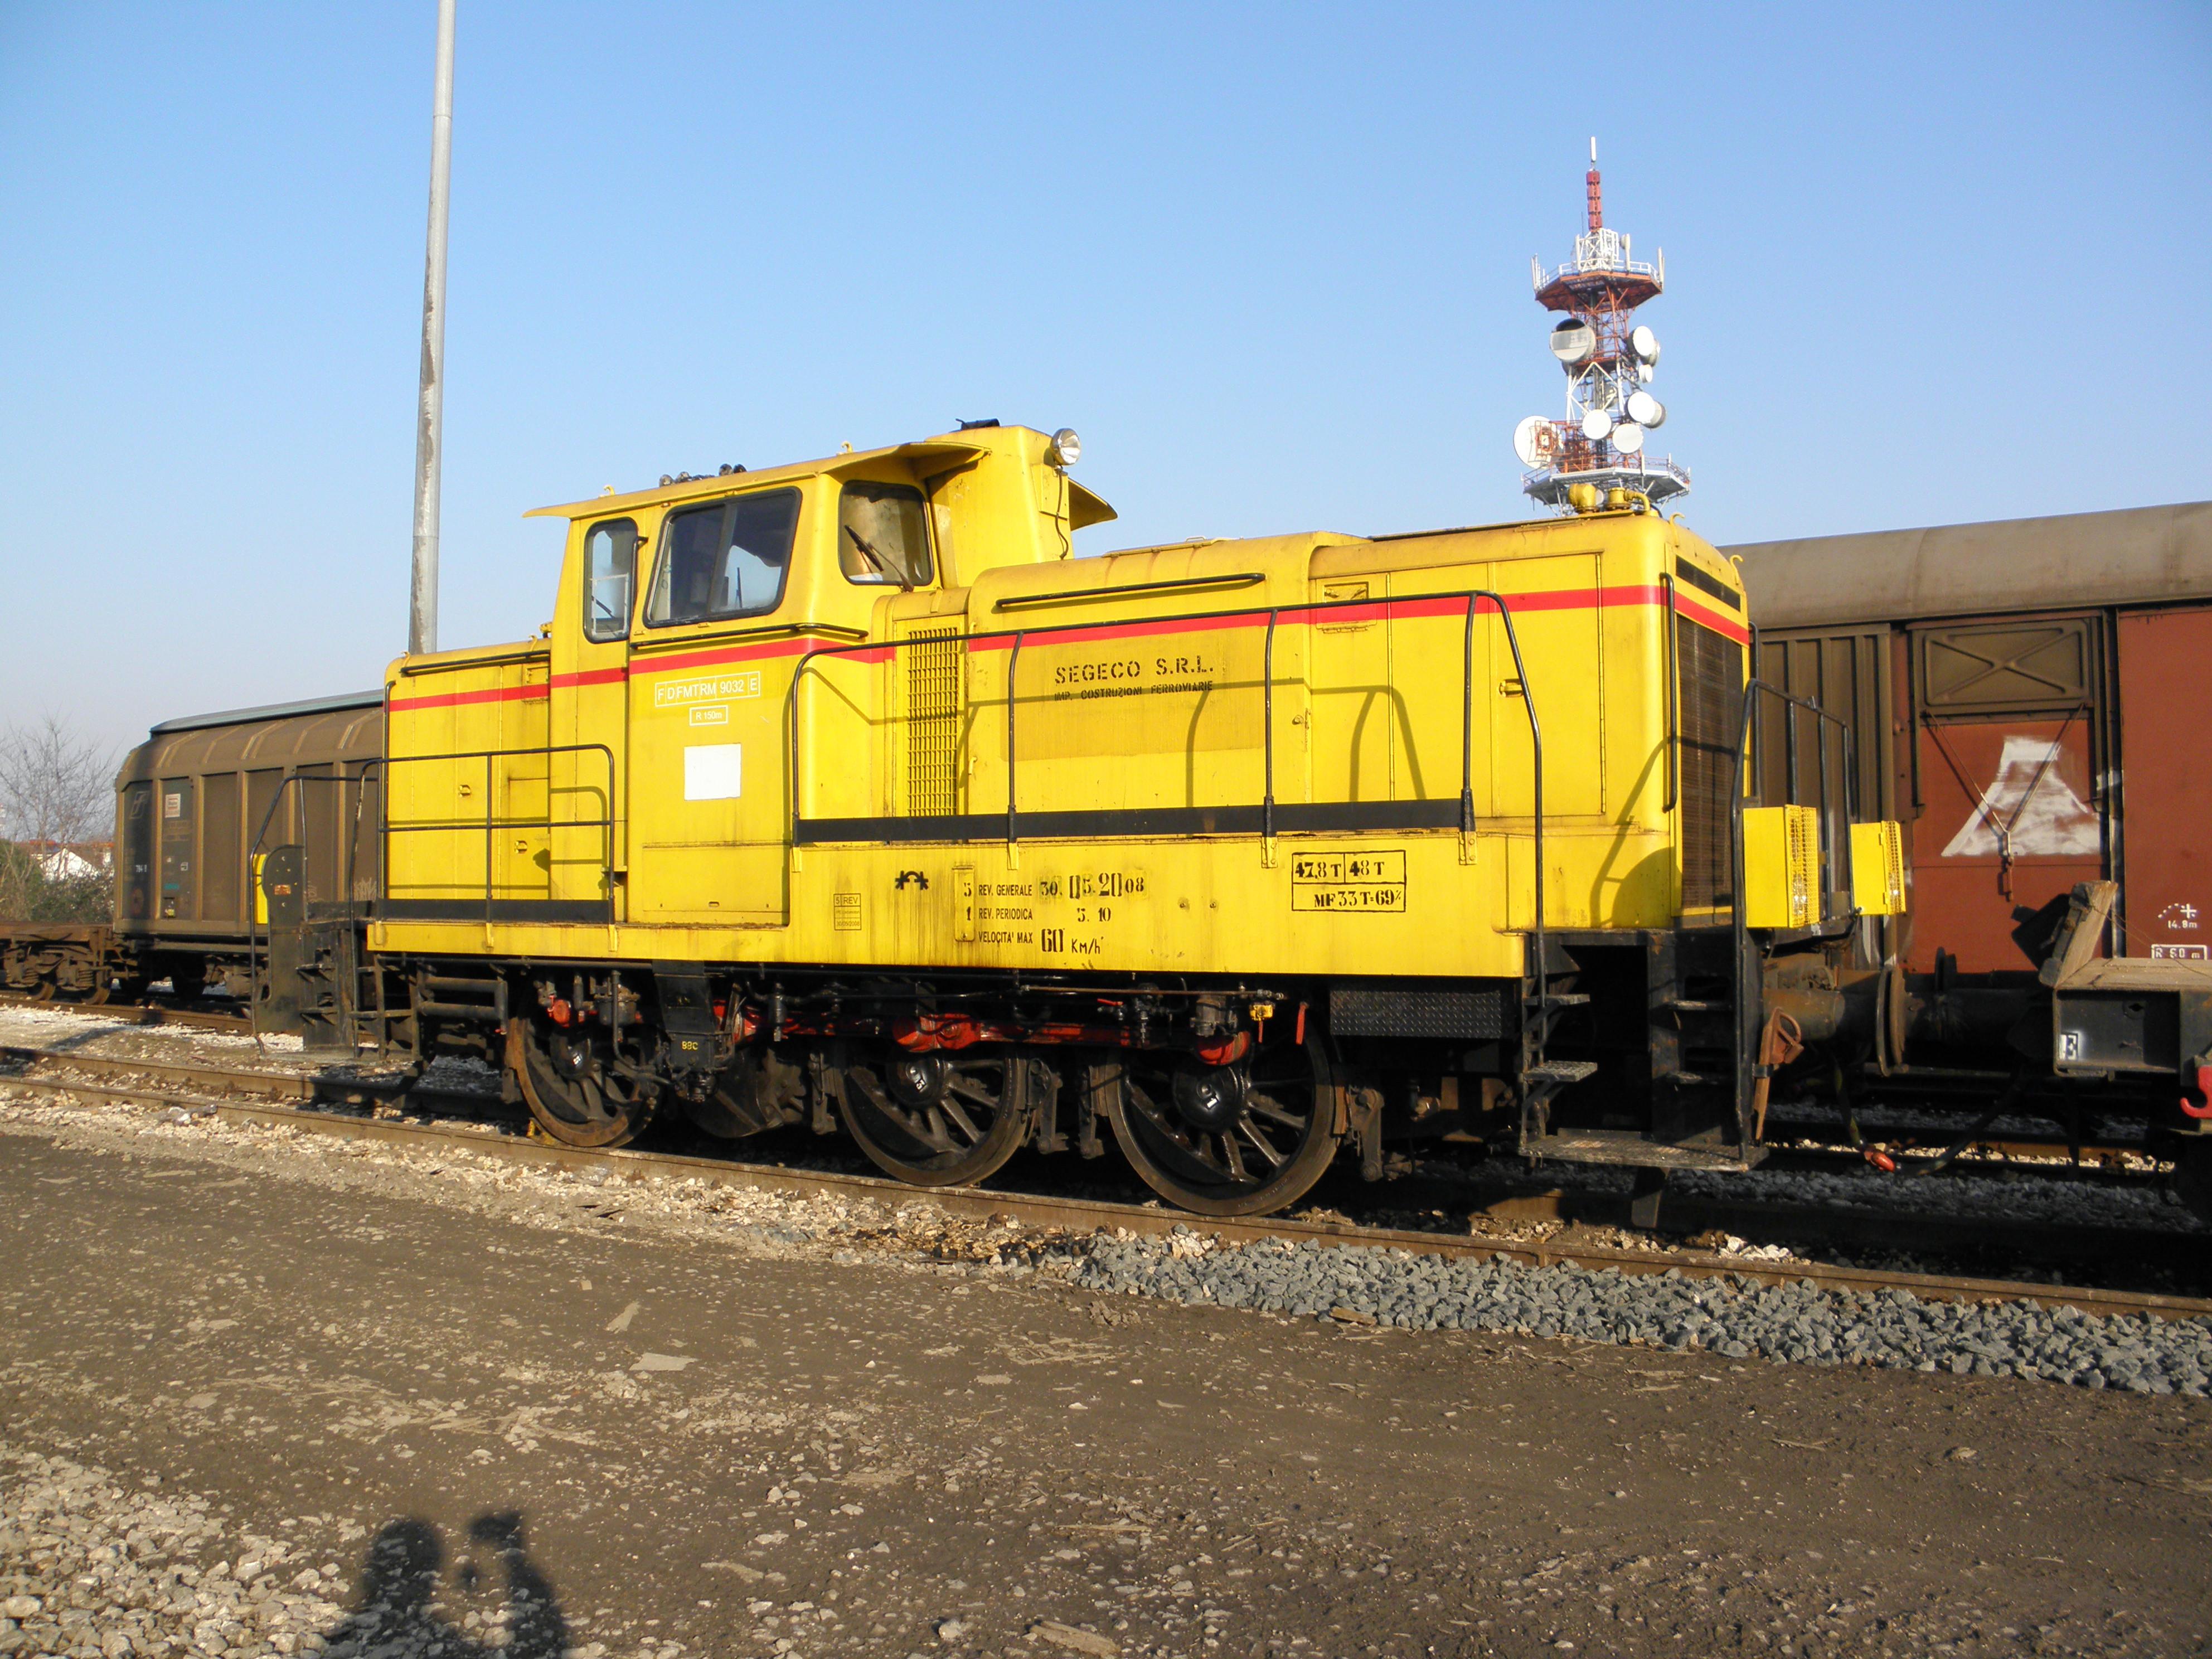 filediesel locomotive in rovigo train stationjpg